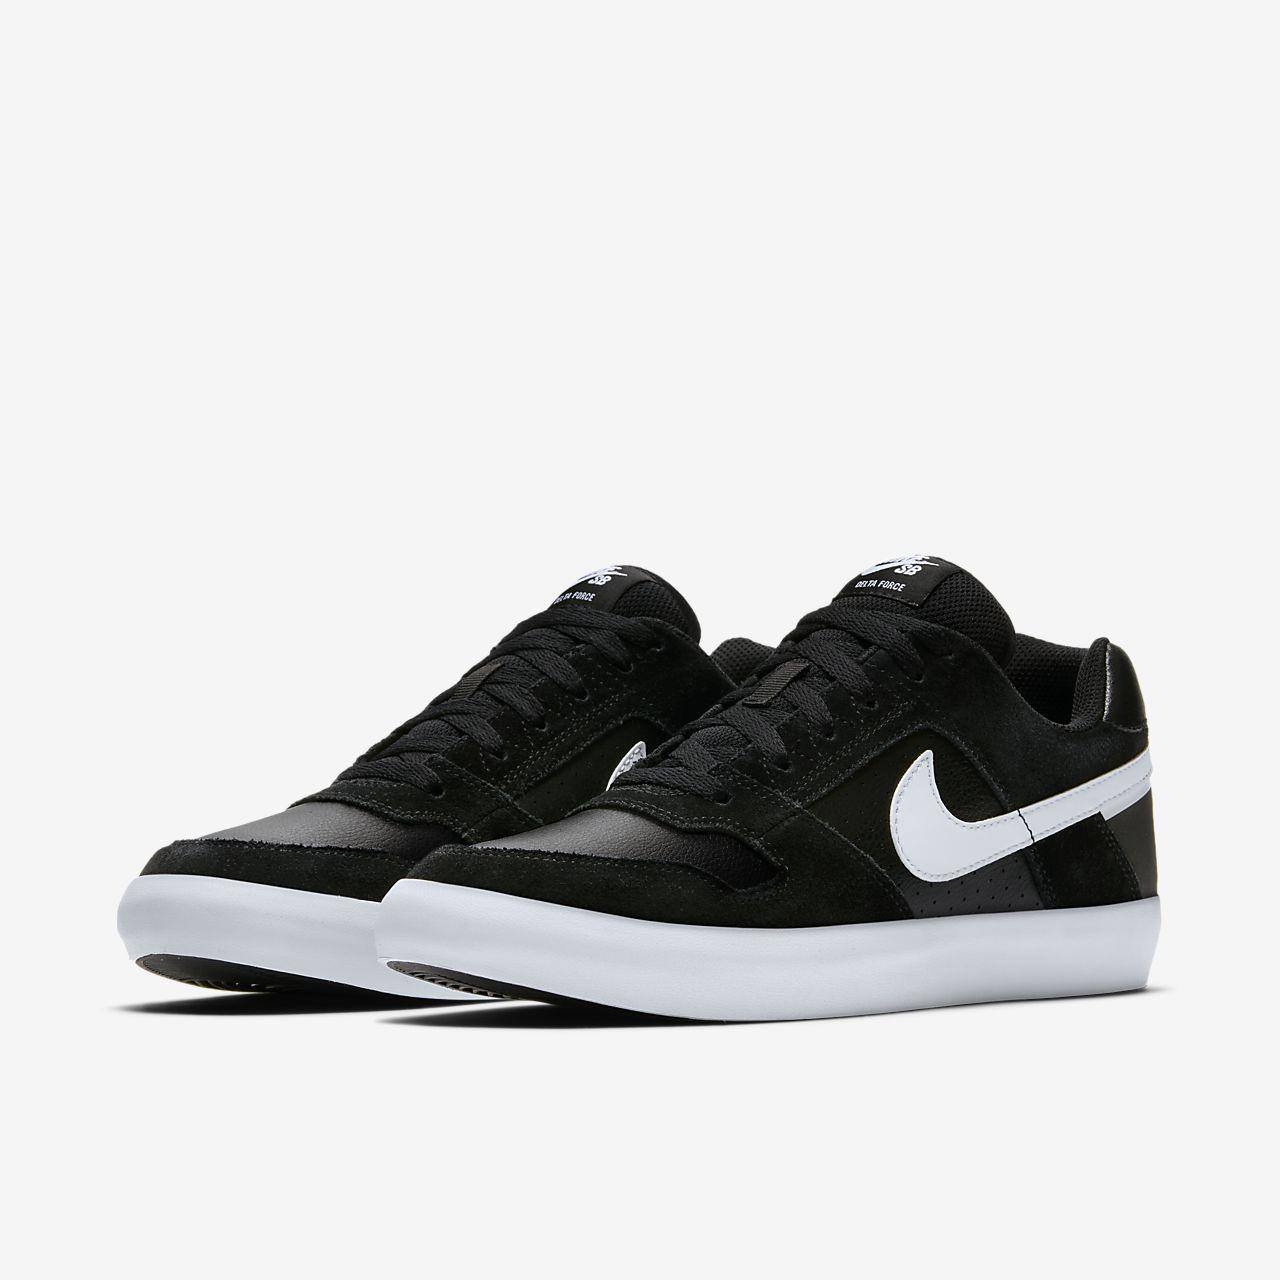 Nike SB Delta Force Vulc Men's Skateboarding Shoes Black/White rQ3917A